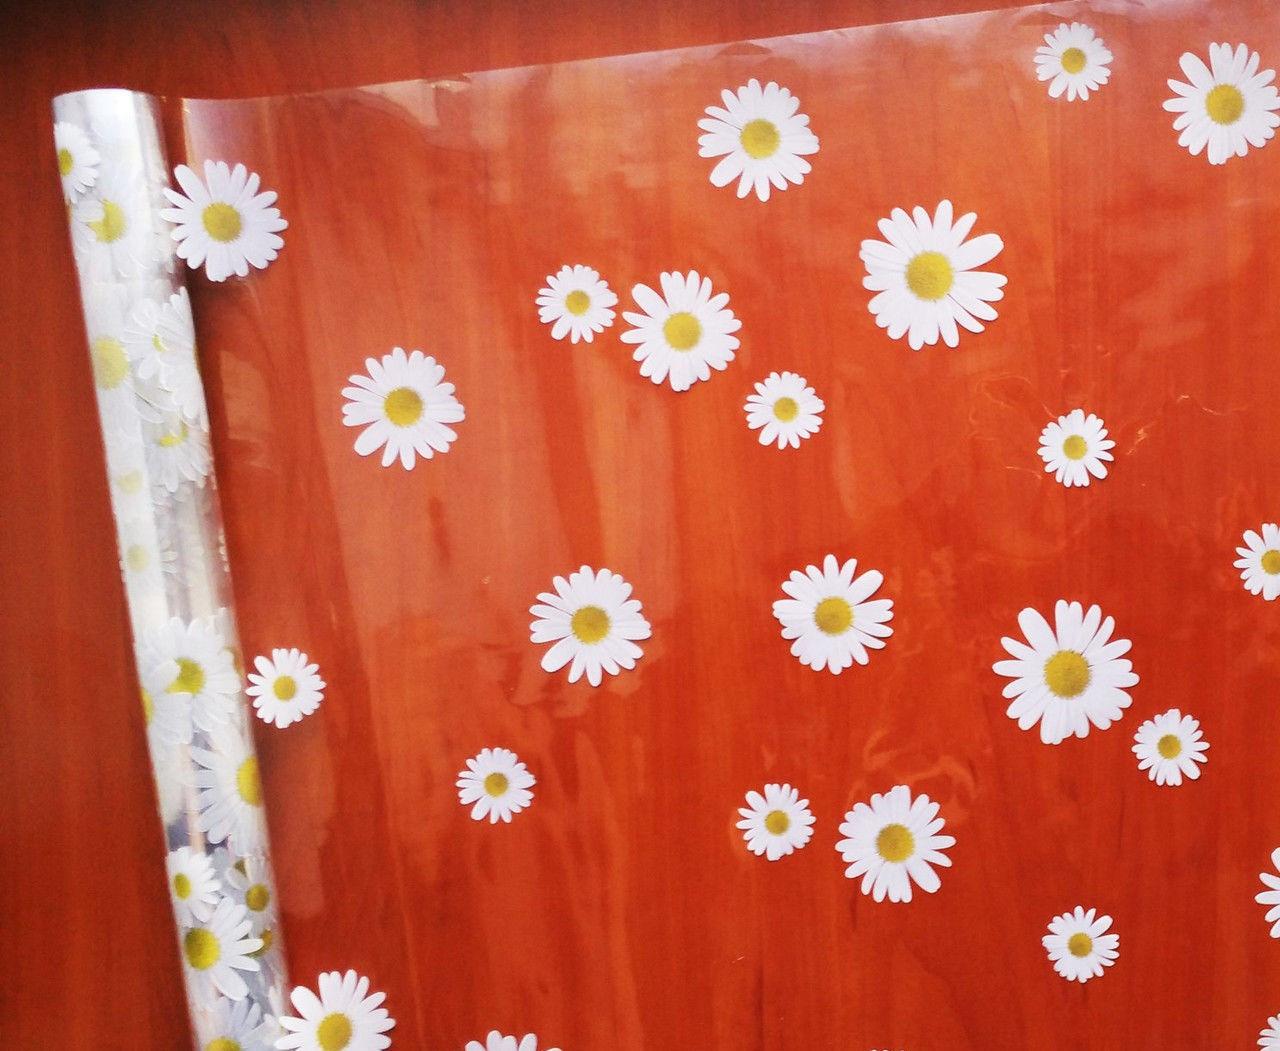 Пленка прозрачная Гербера 60 см 400 гр - Крамничка флориста в Киеве